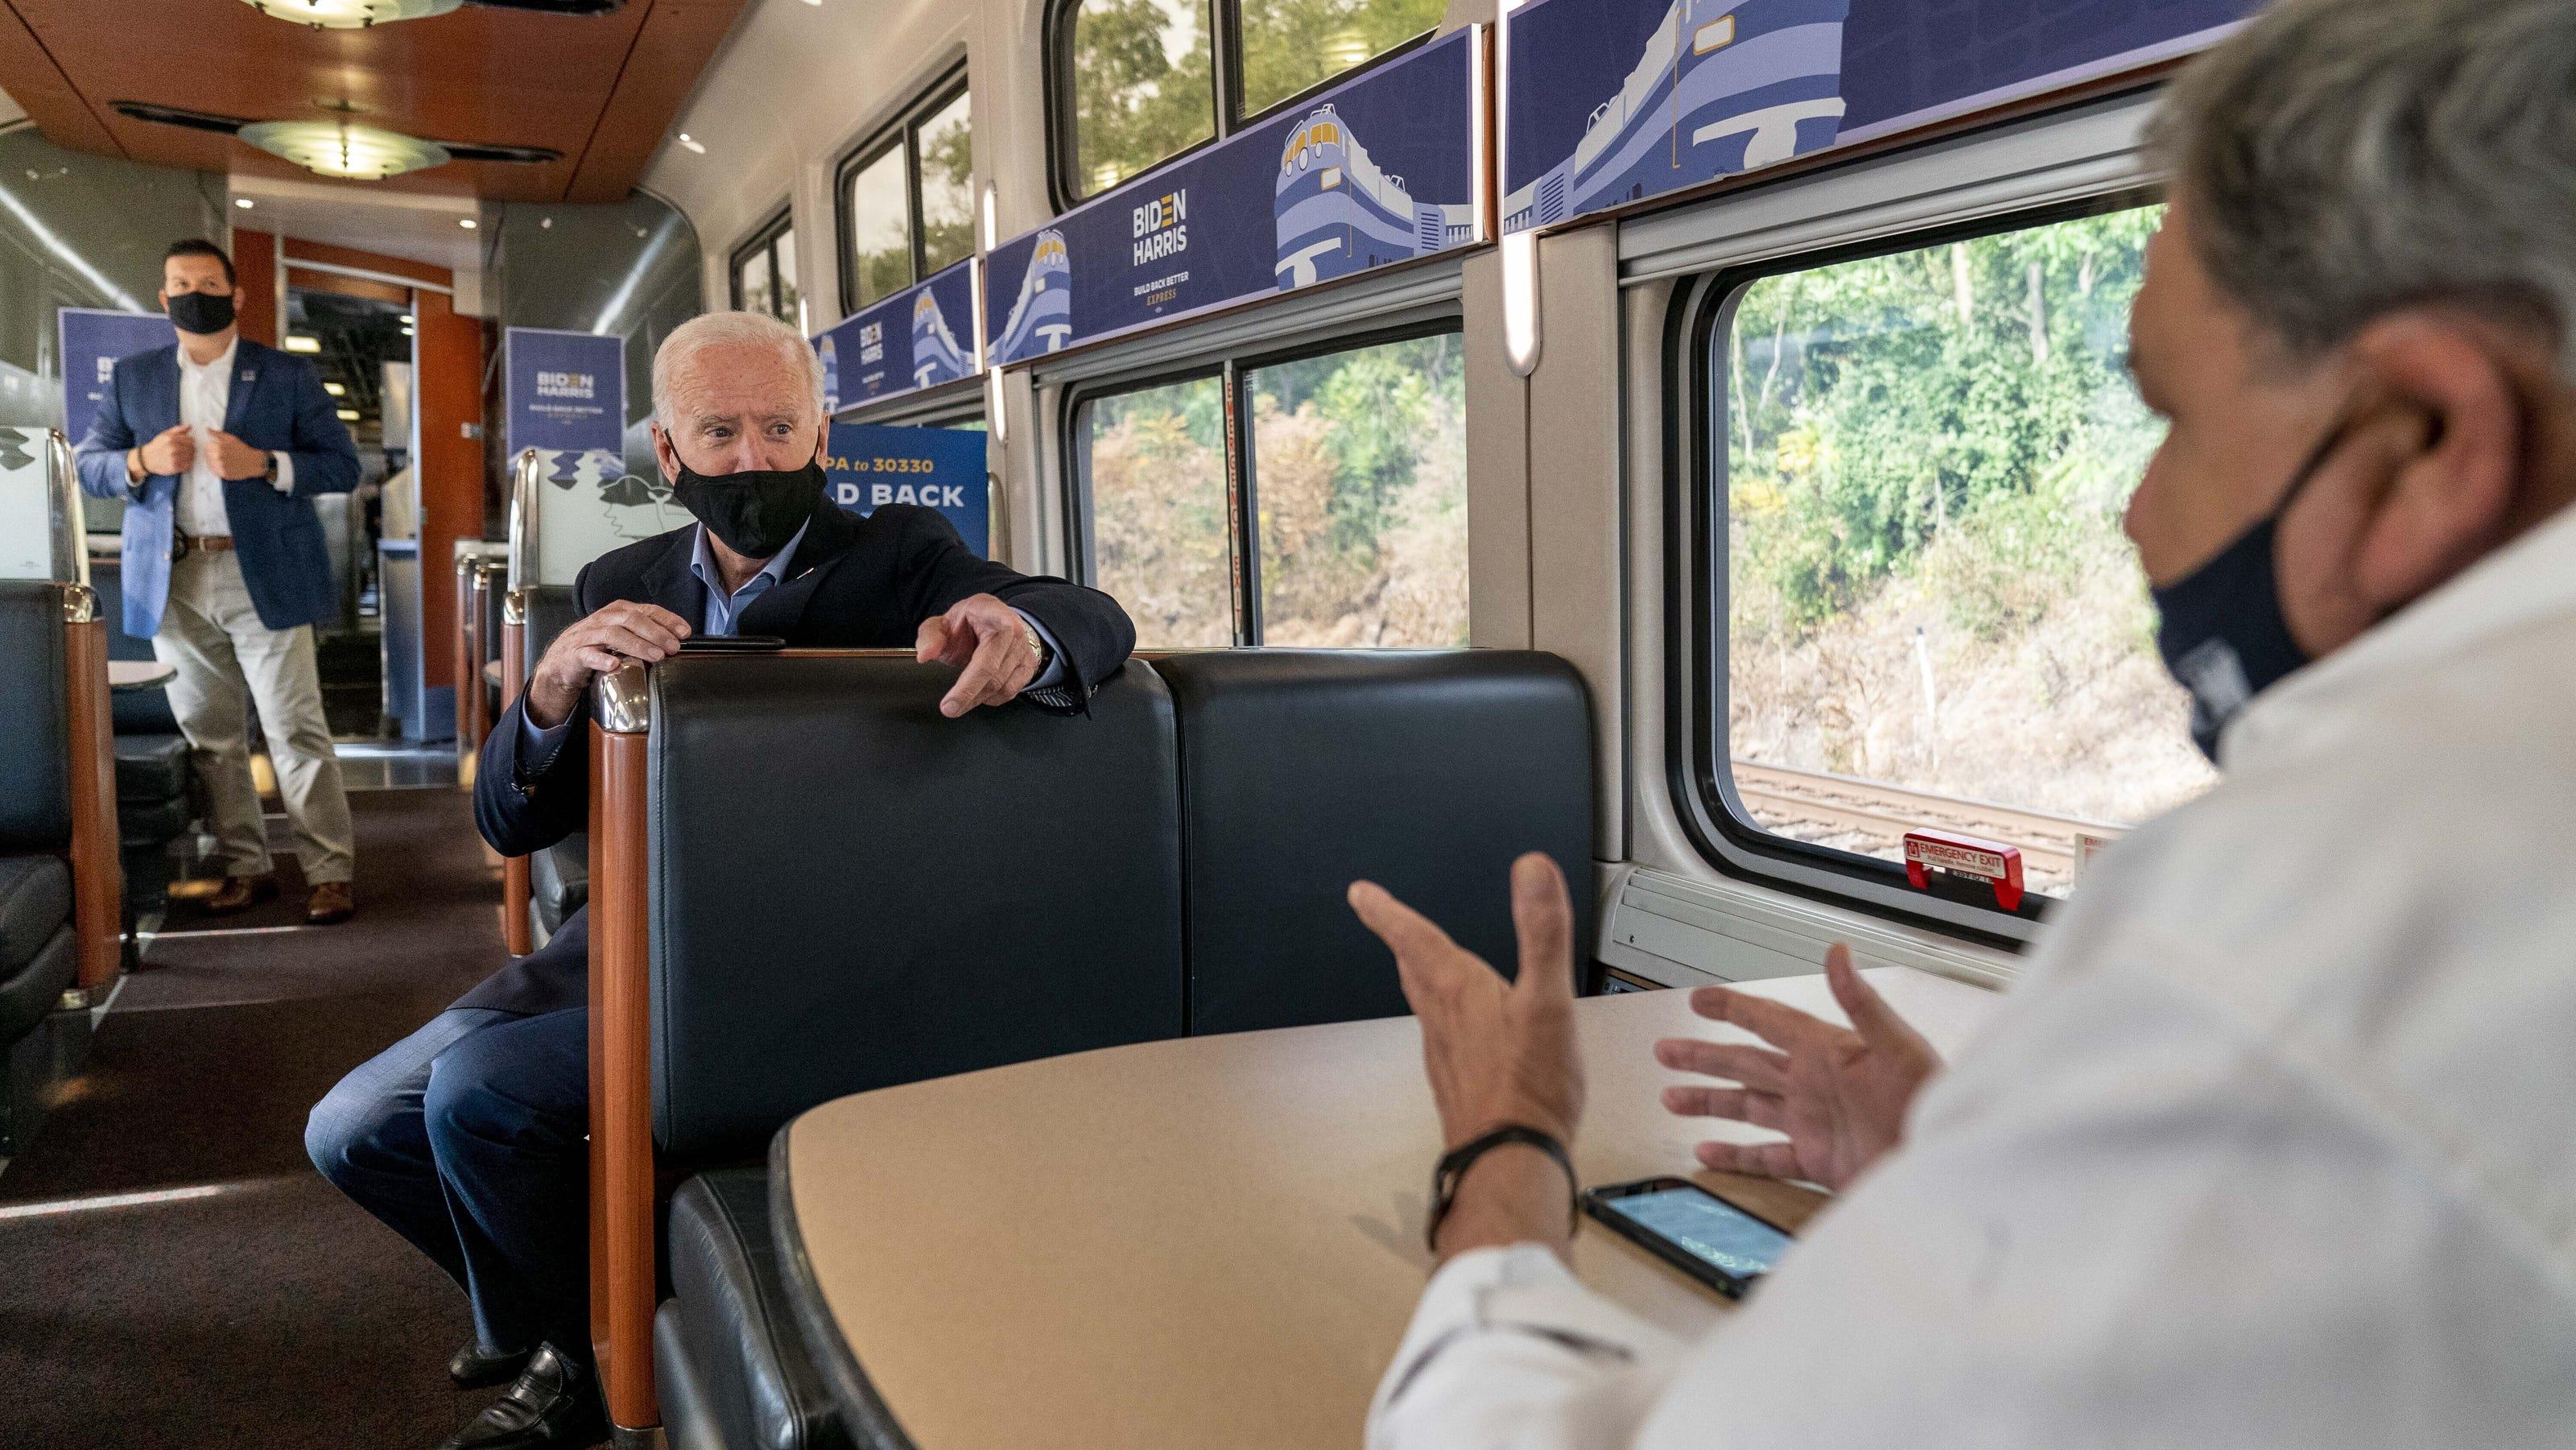 aa70016f 4c66 4749 81e4 3a9c895dbe88 joe biden on train from cleveland 9 30 20 - Joe Biden the railroad President